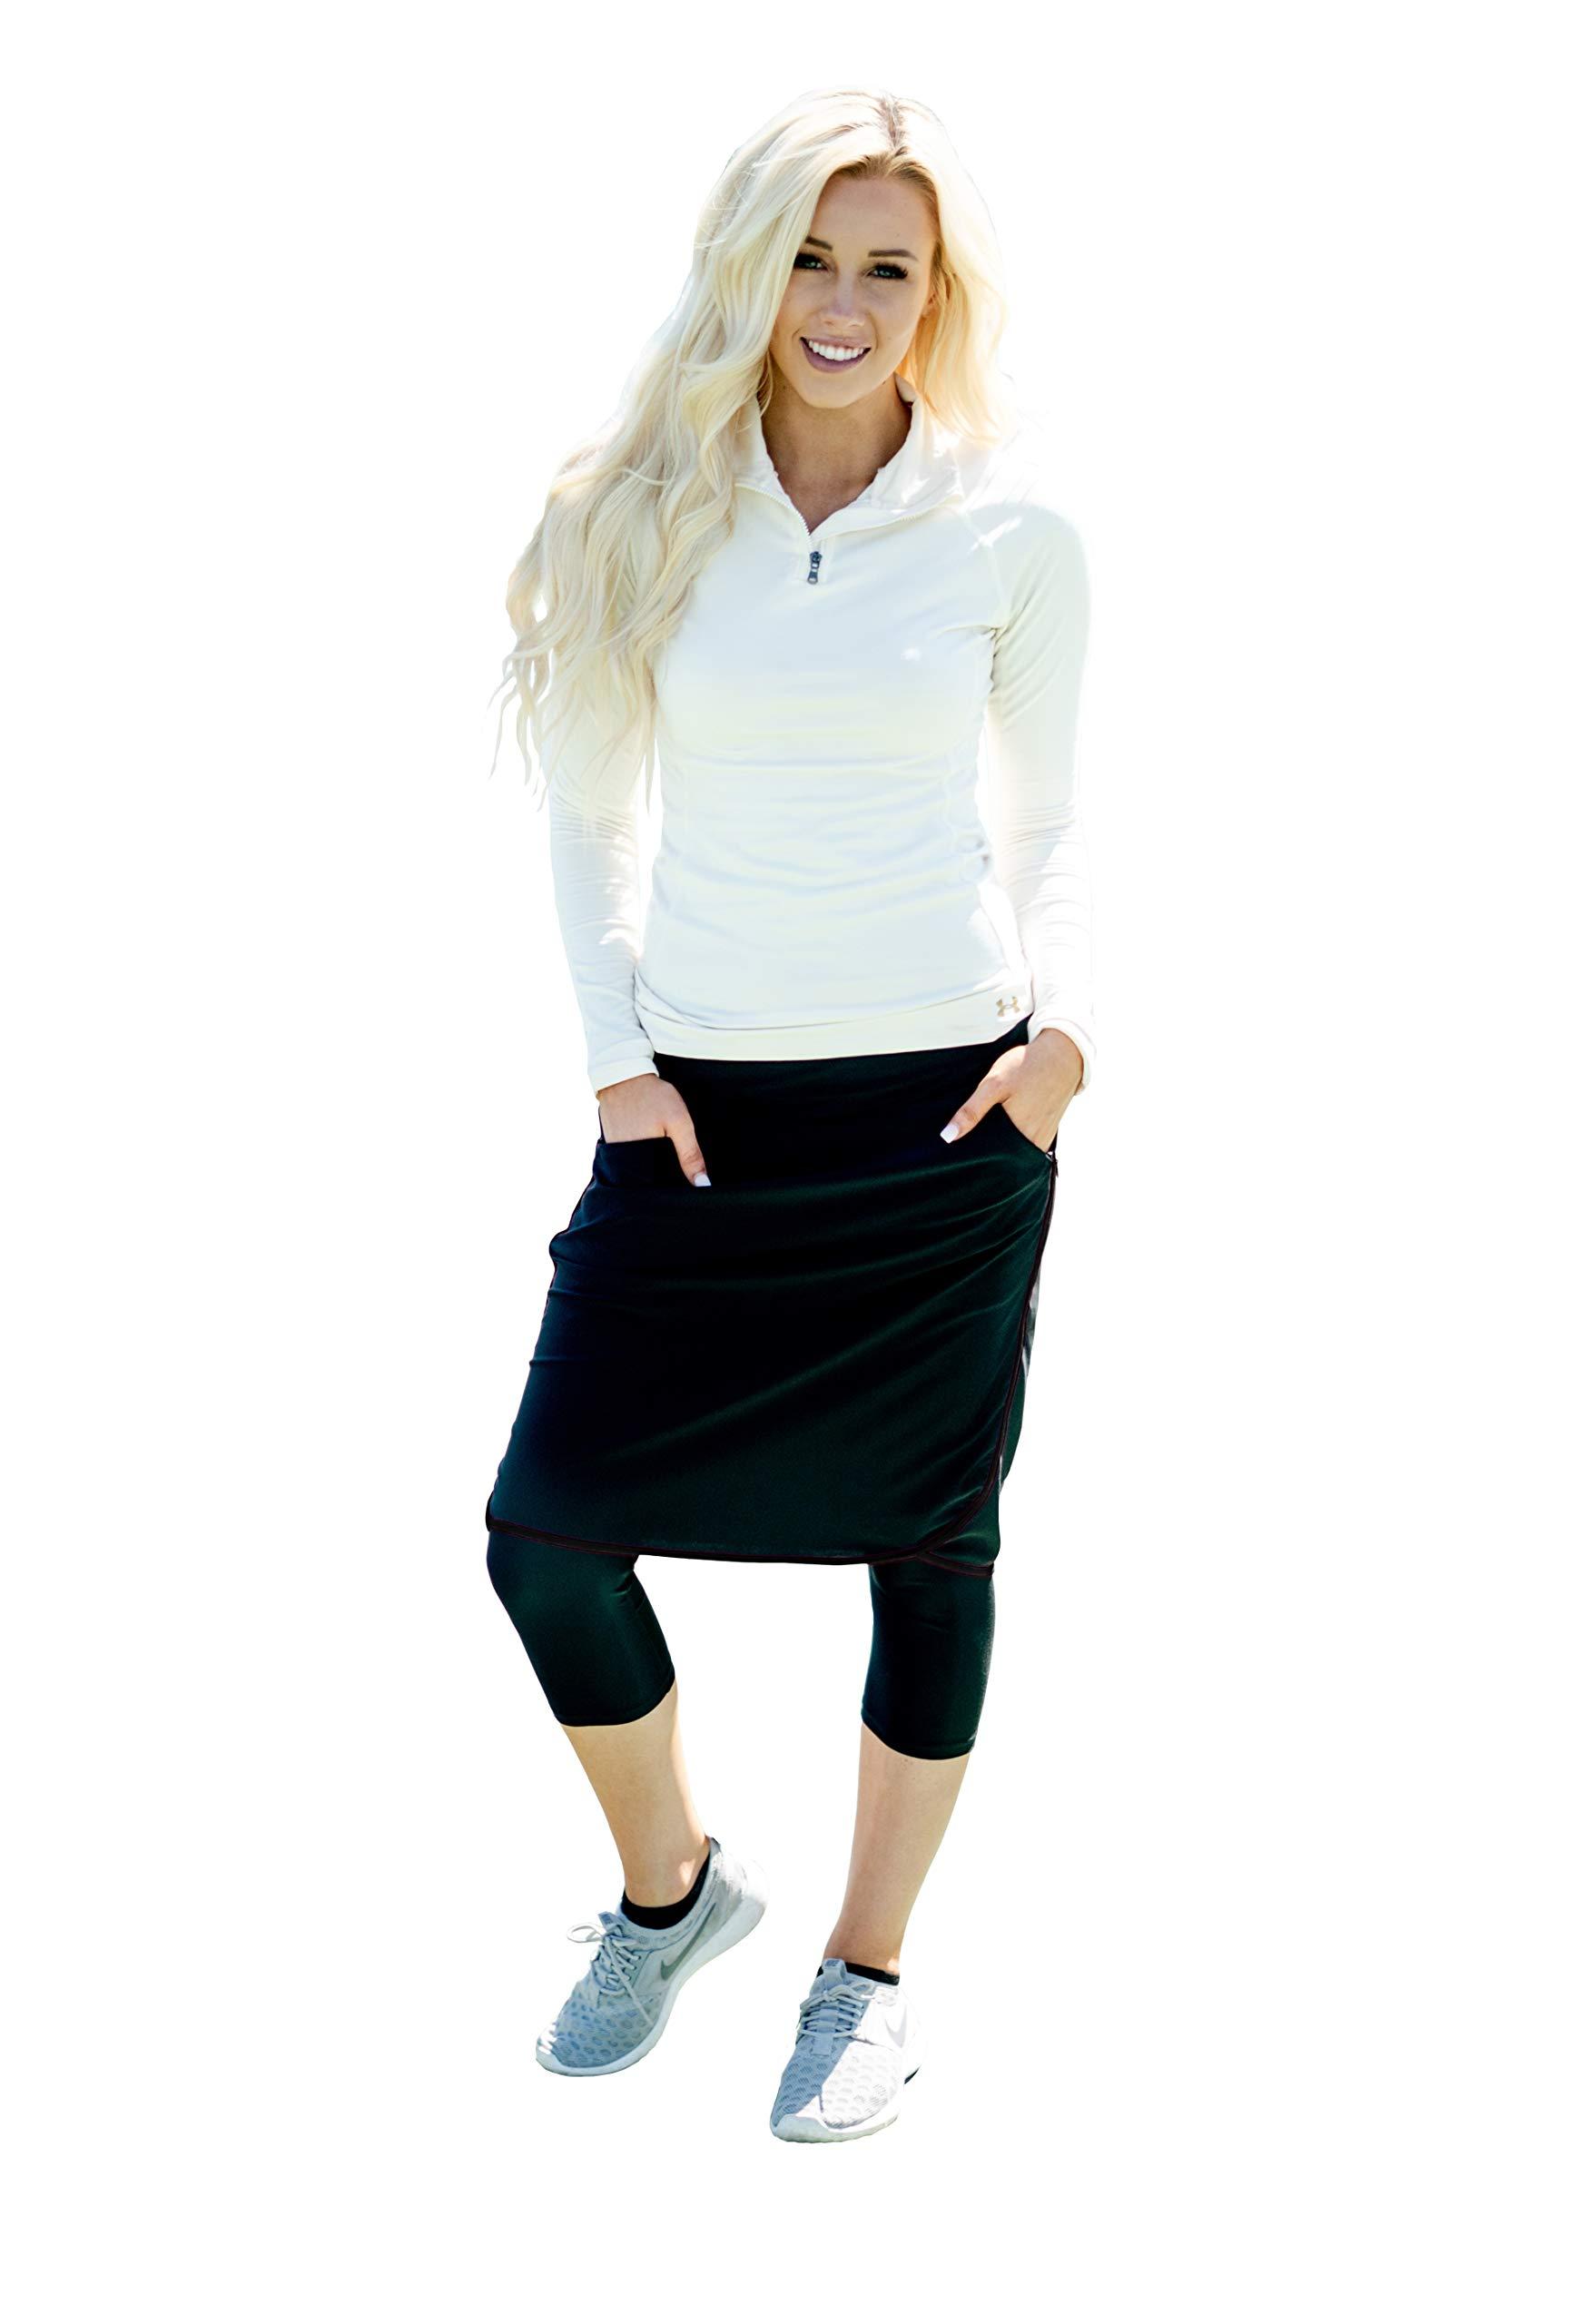 Ella Mae Sports Skirt for Women: Knee-Length Workout Skirt w/Attached Leggings Black